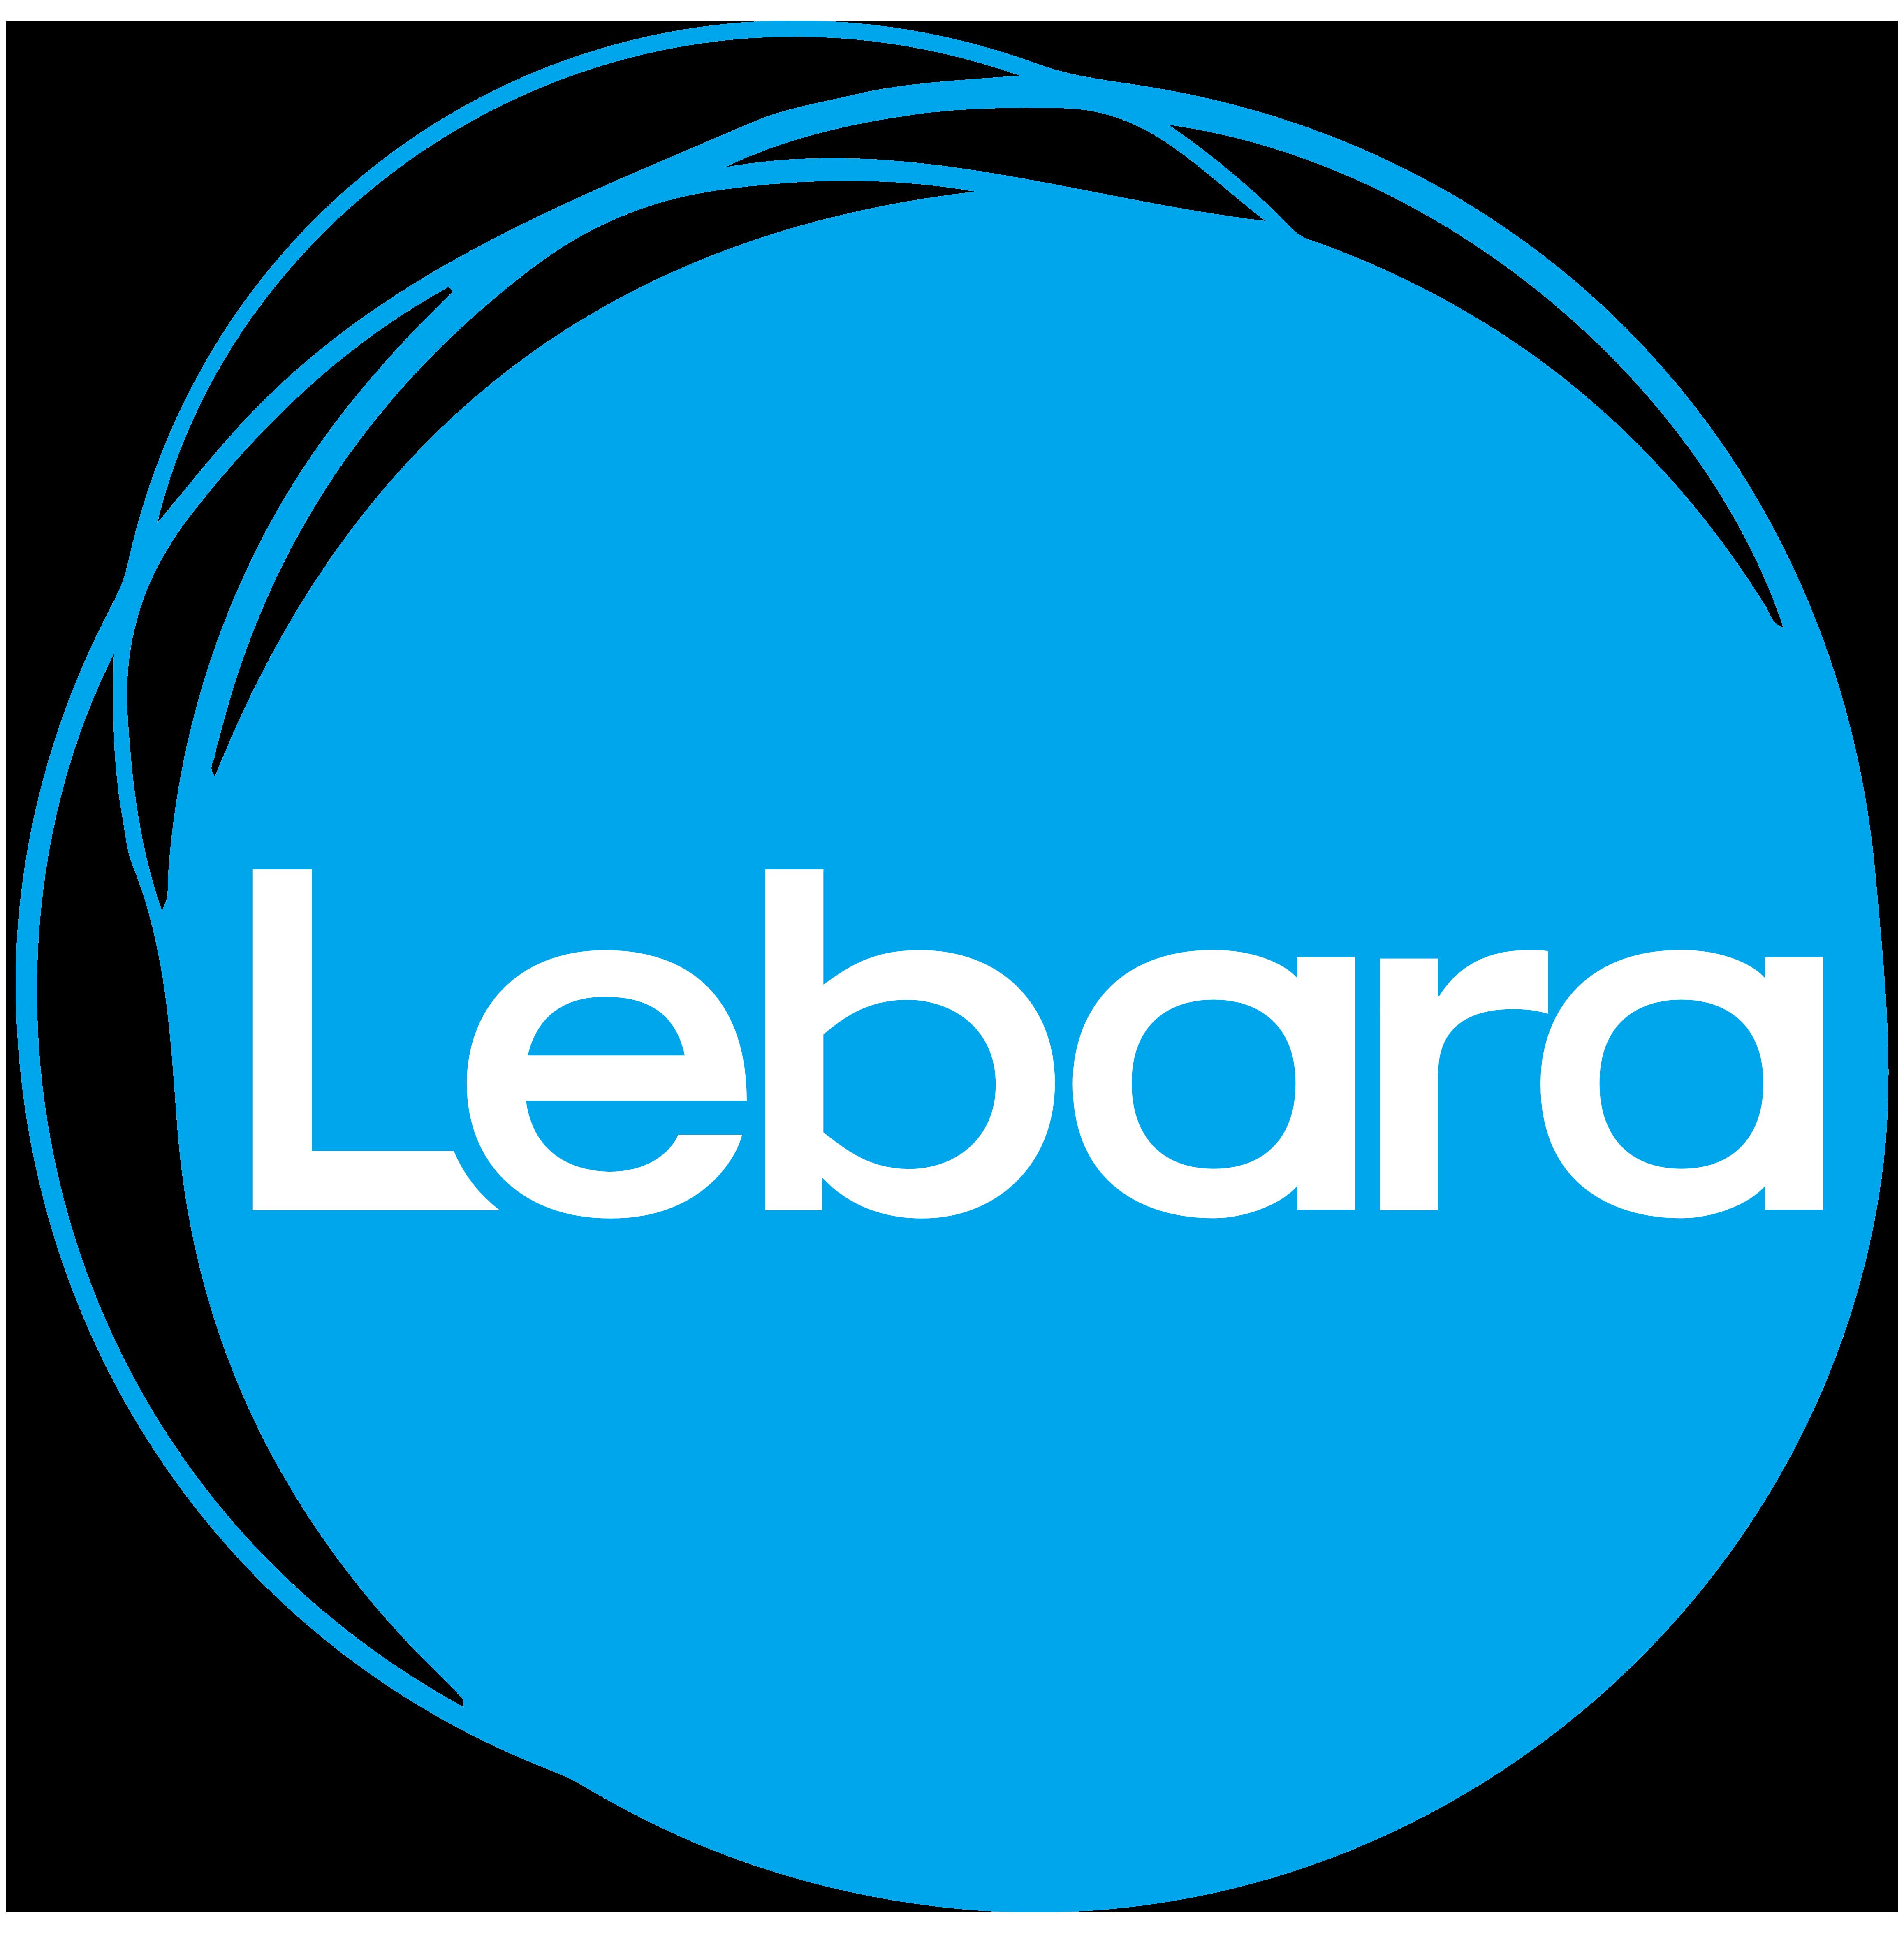 Lebara mobile logos download for Mobile logo